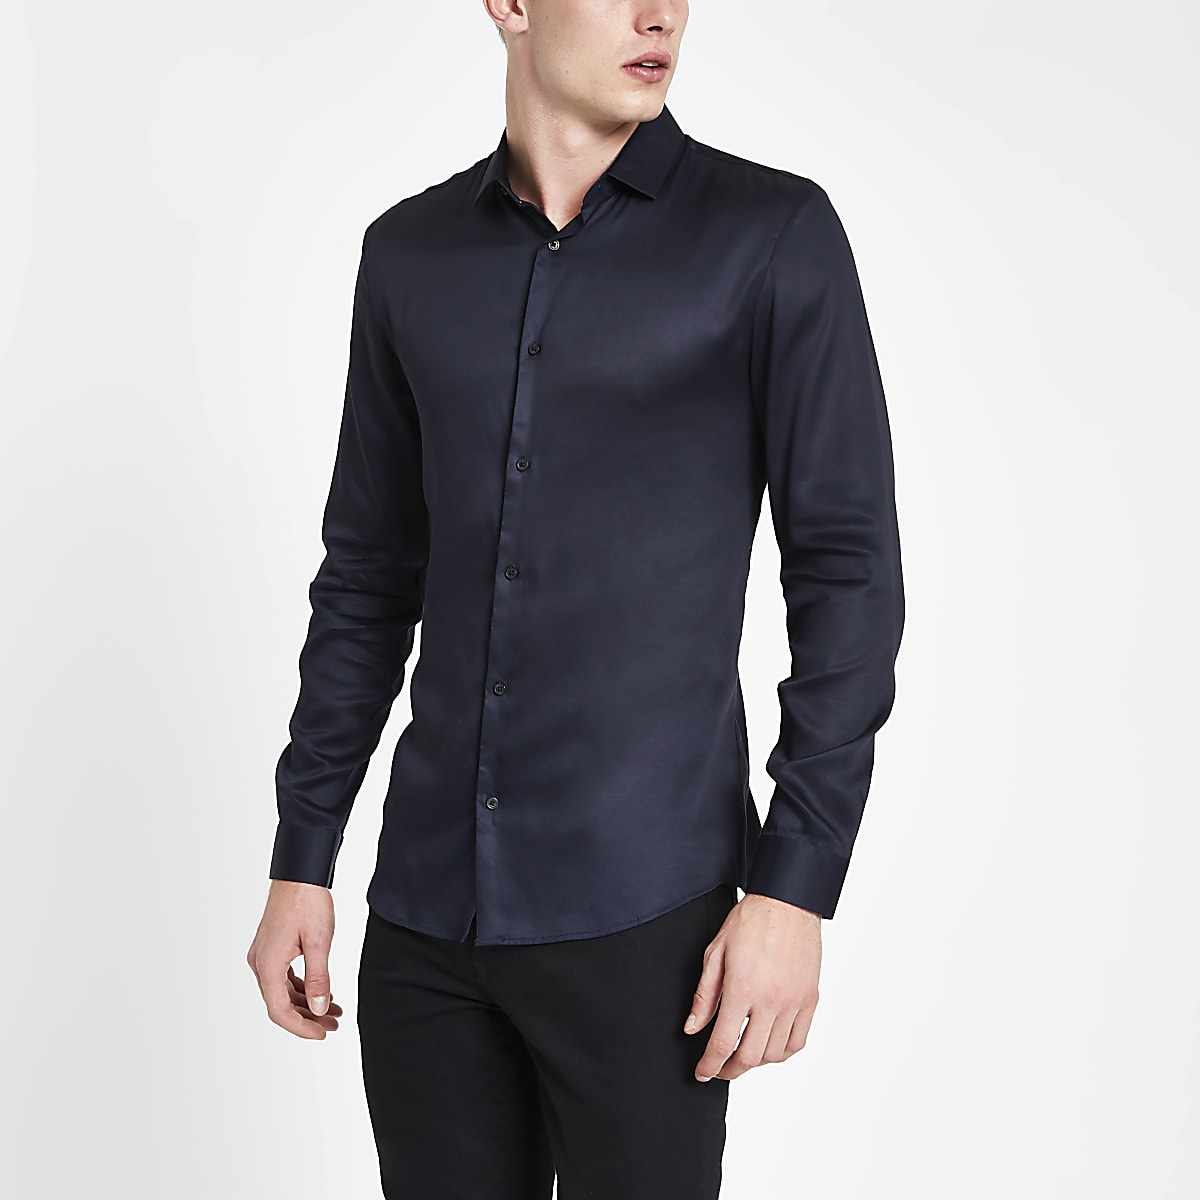 Navy button-down long sleeve shirt